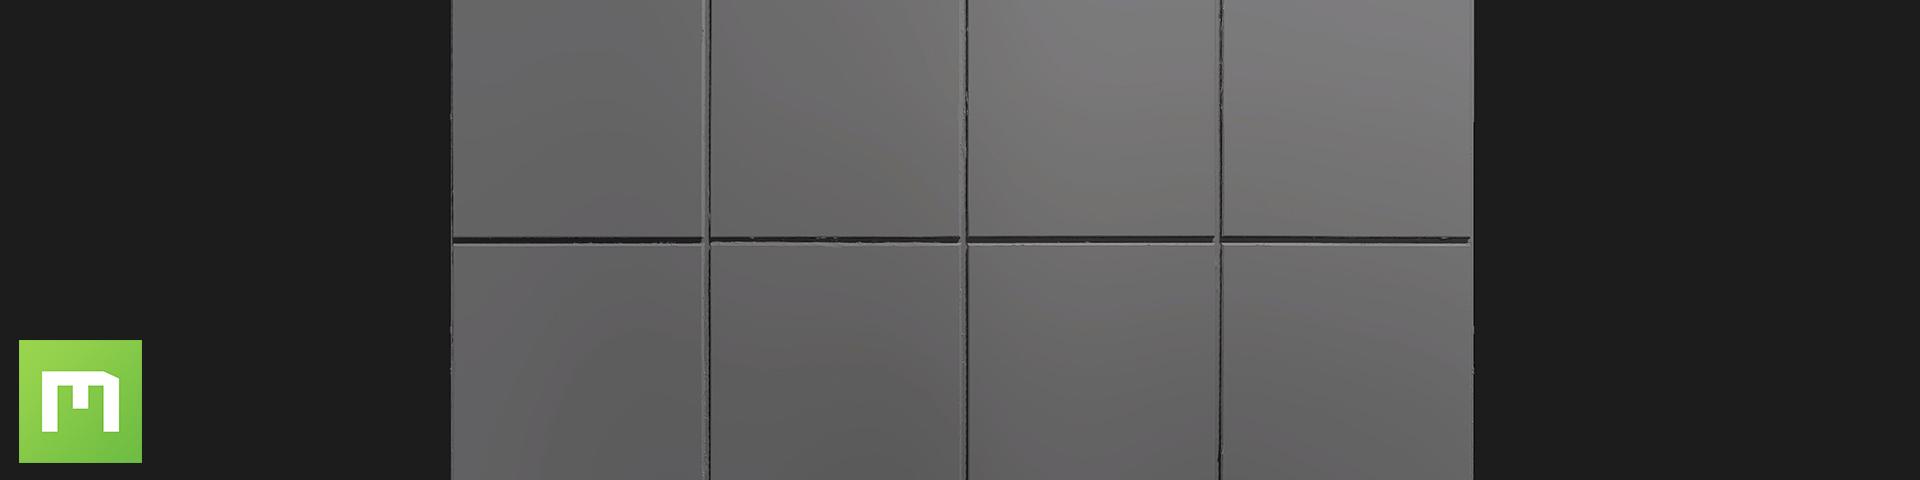 DispCon44